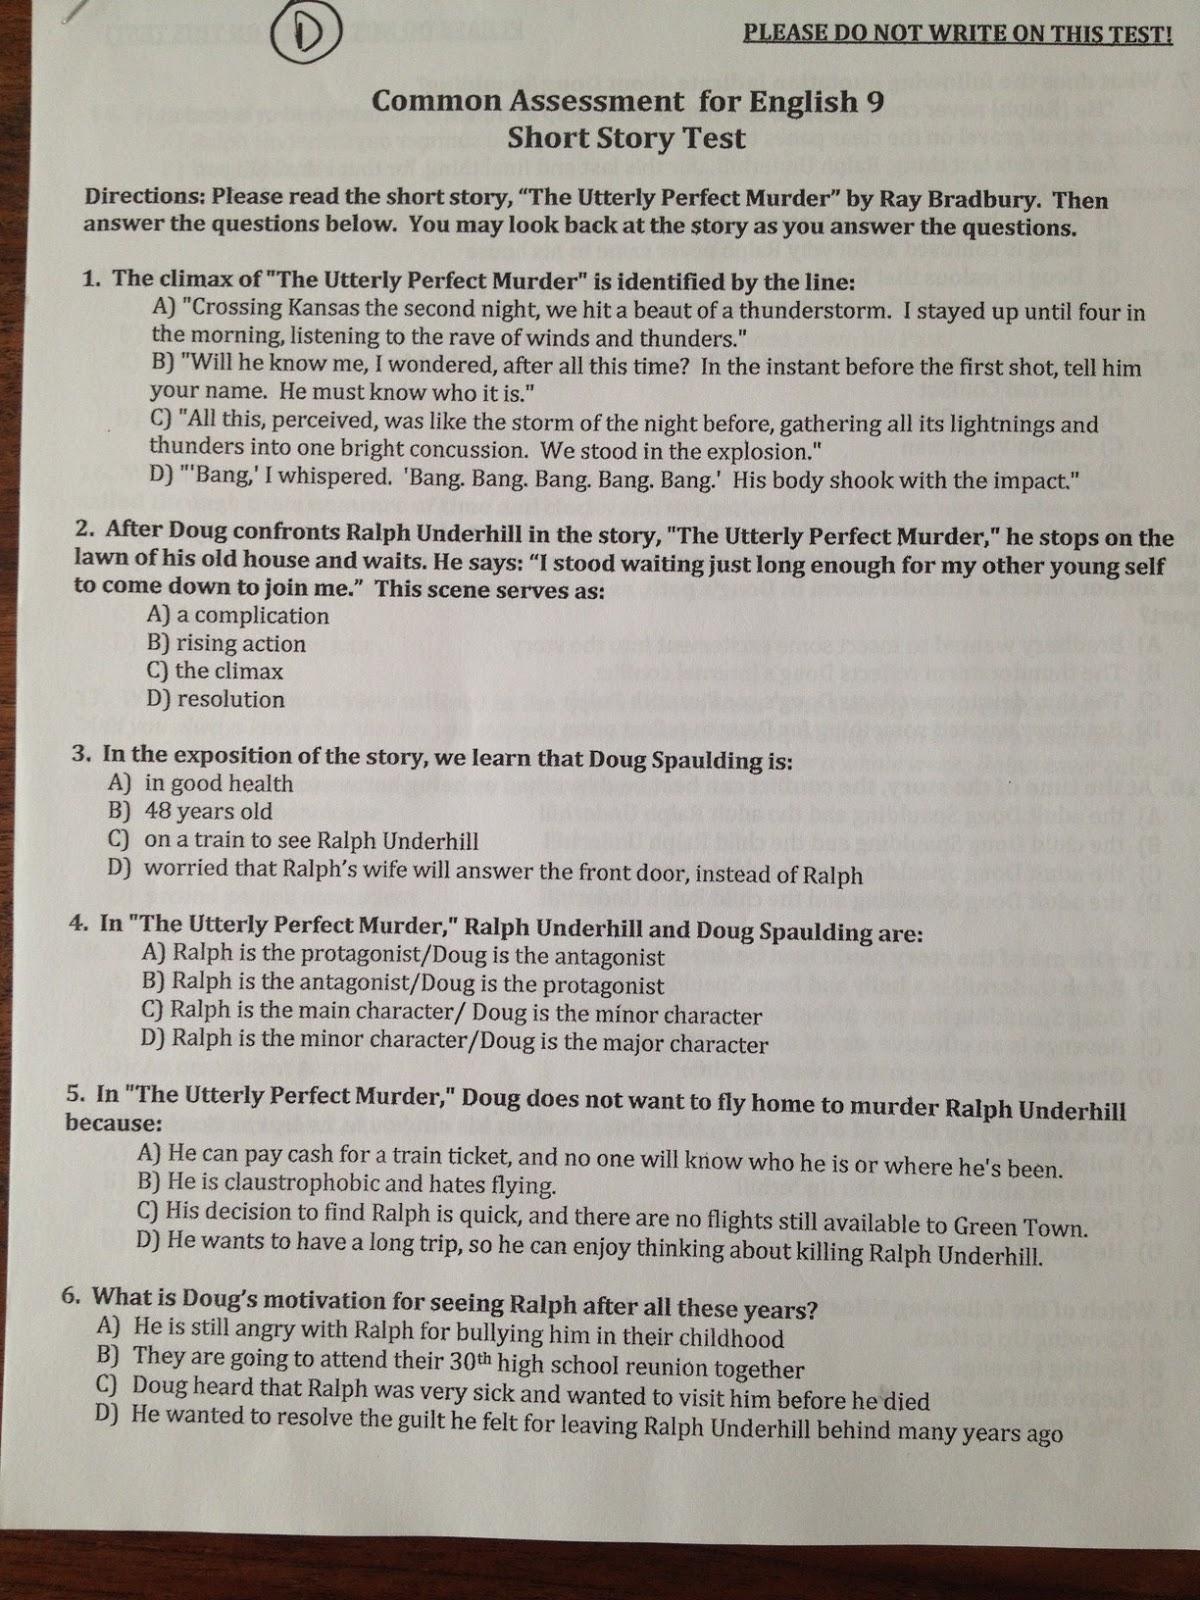 Single Subject Teaching Credential Program: Common Assessment on